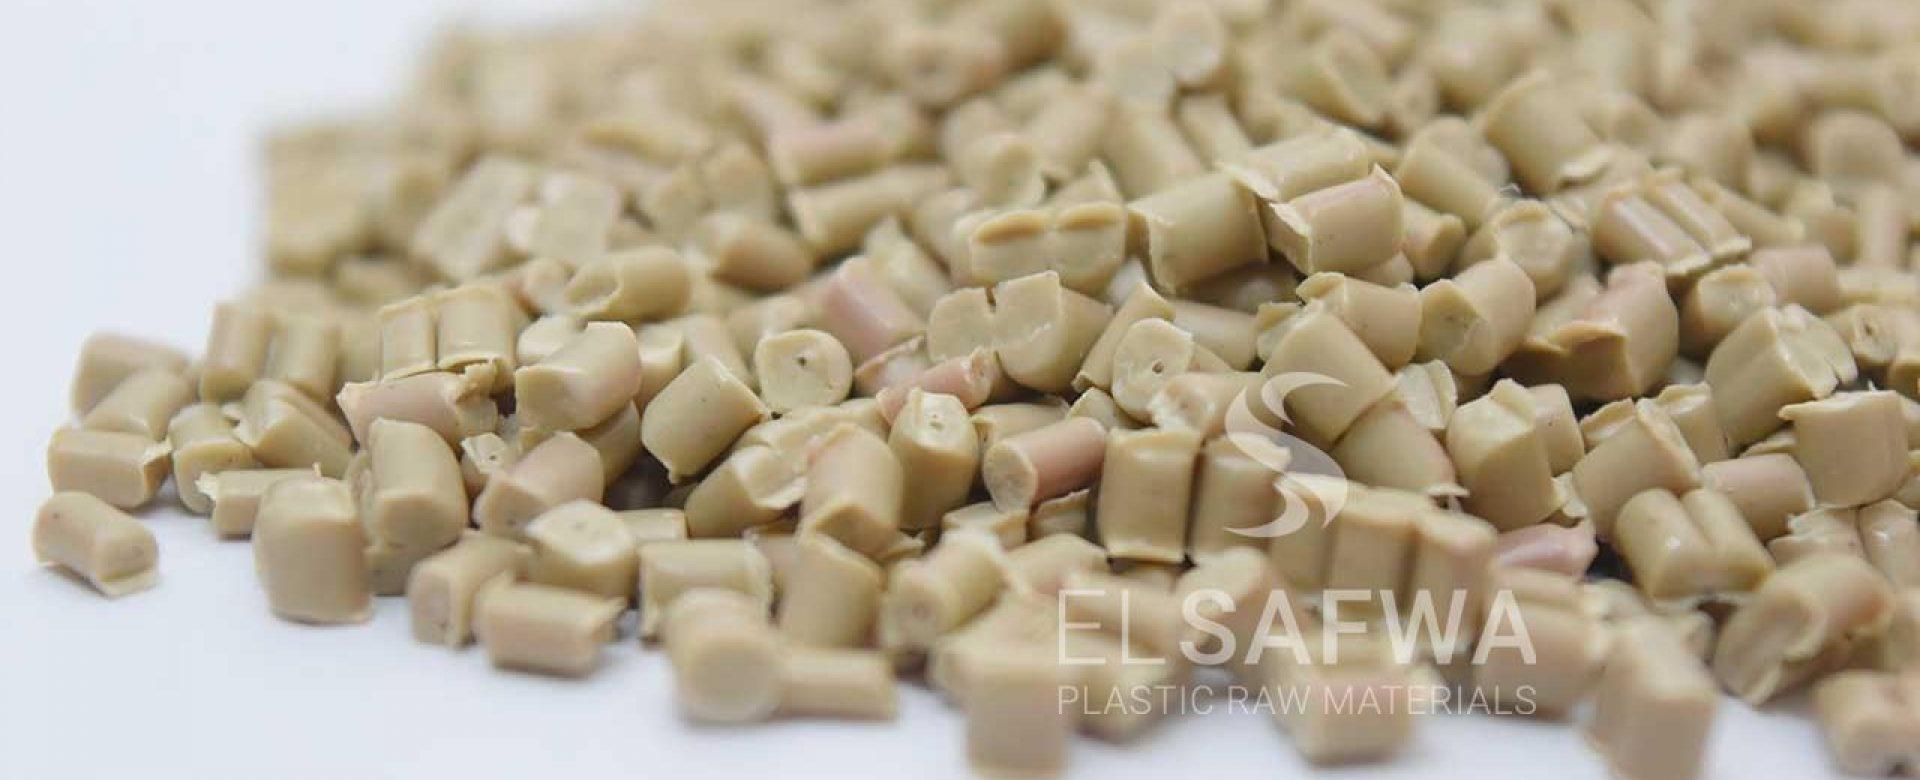 El-safwa-trade-plastic-trading-raw-materials-recycked-pp7